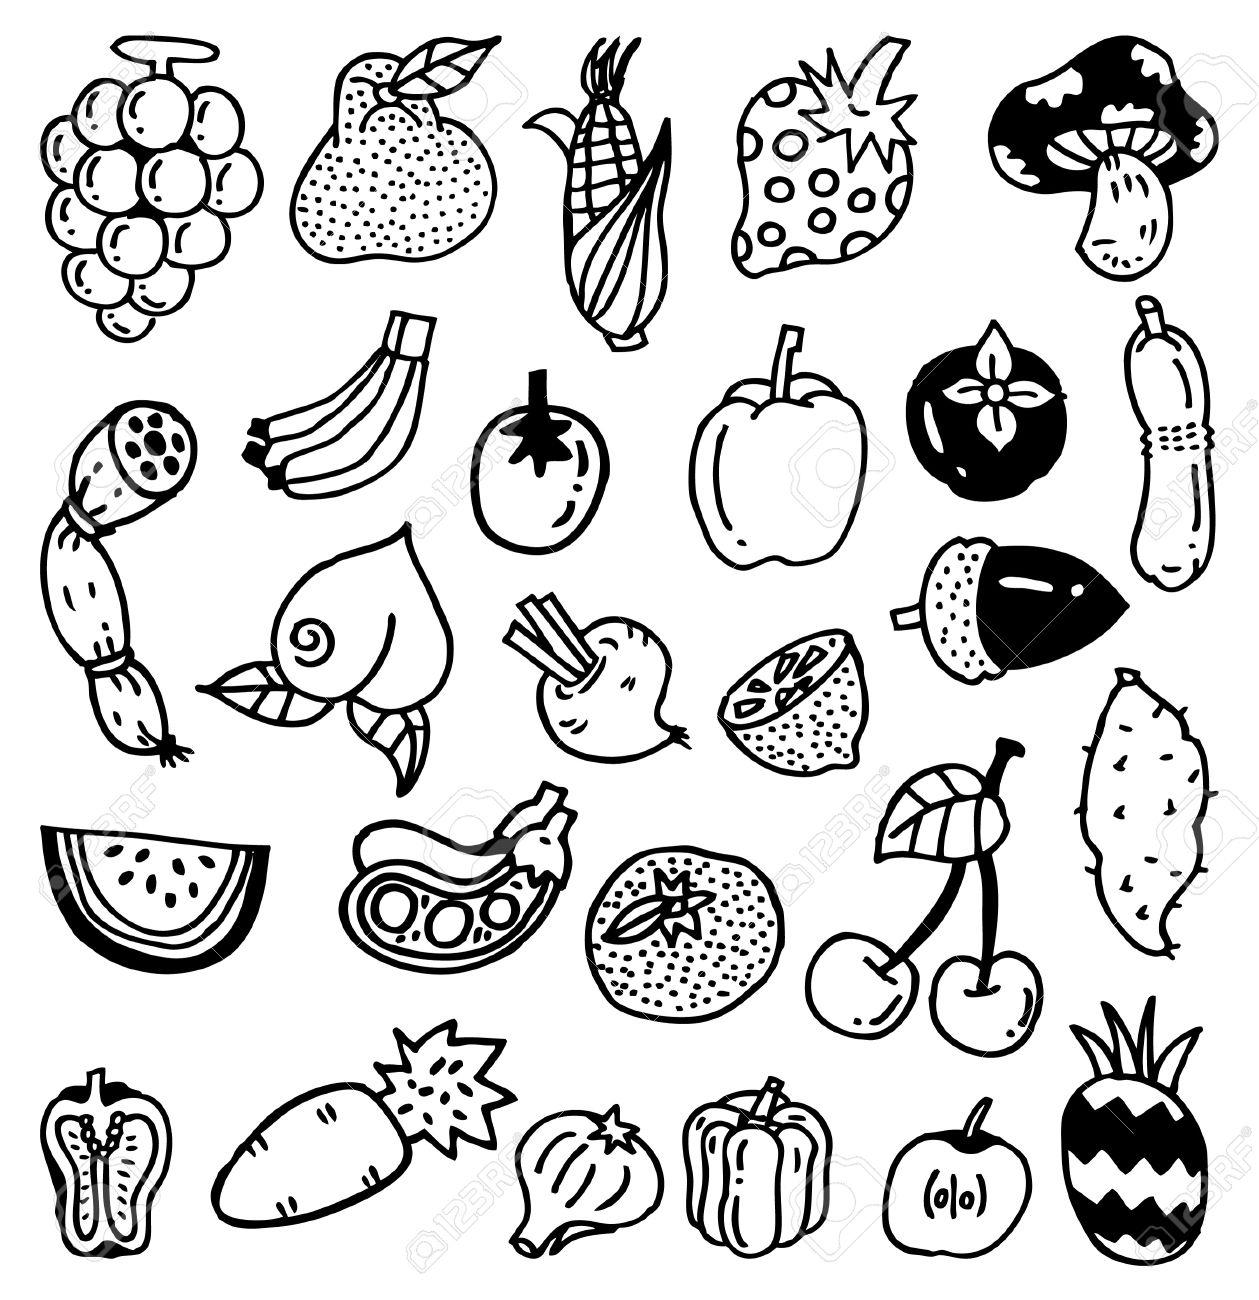 1259x1300 Cartoon Fruit Drawings Drawn Fruit Fruit Vegetable